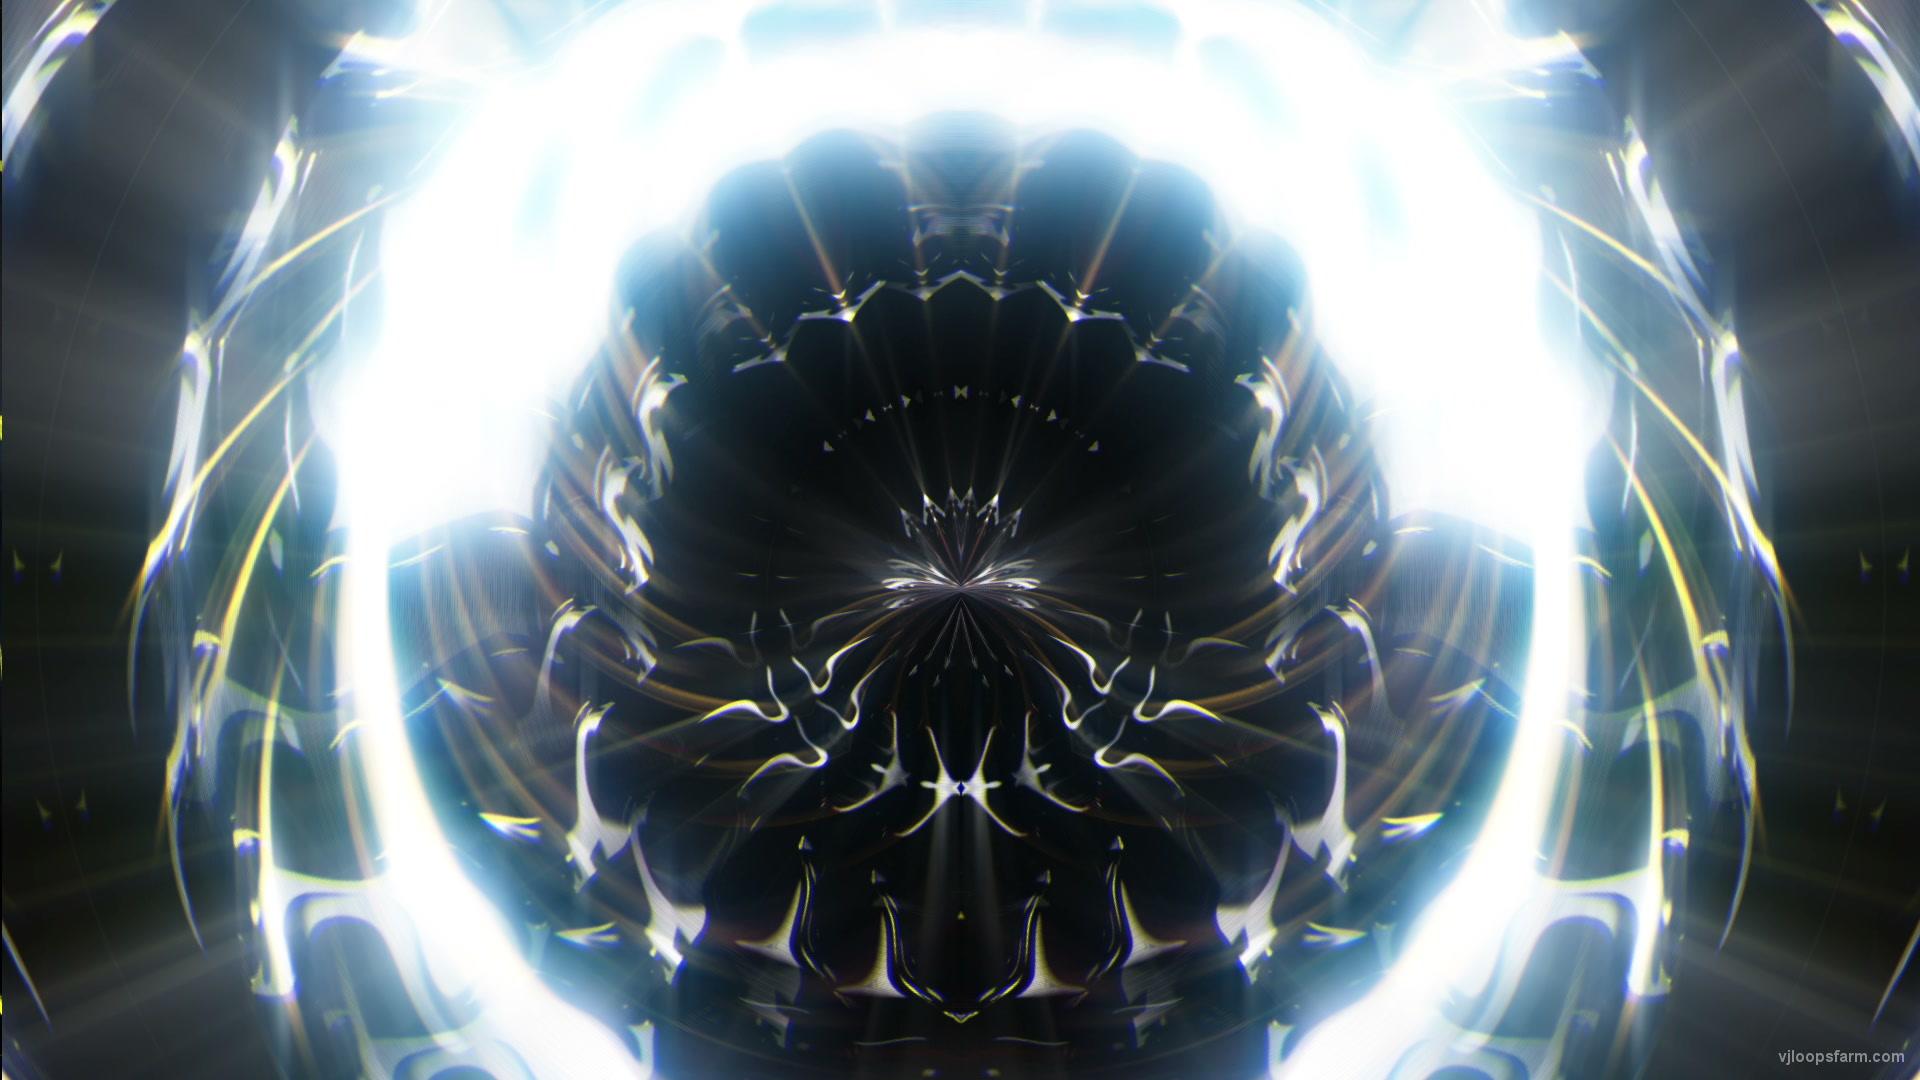 vj video background Dazzling-light-reflection-on-water-surface-Eye-Strobbing-effect-on-motion-background-Video-Art-VJ-Loop_003